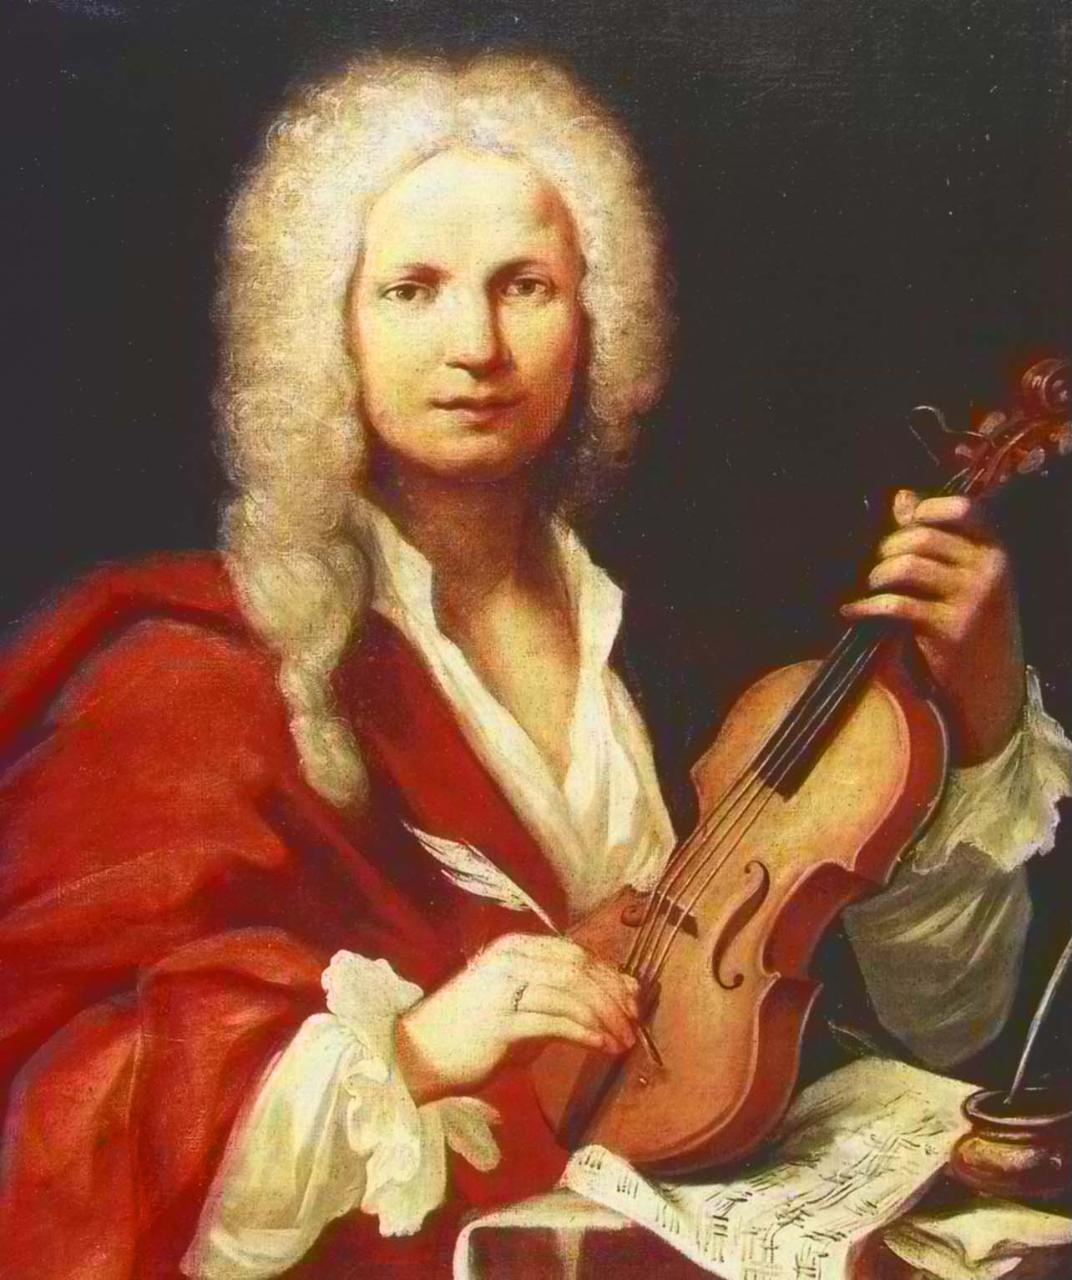 Vivaldi the sound of Venice - Virtual Guided Tour - Live Show